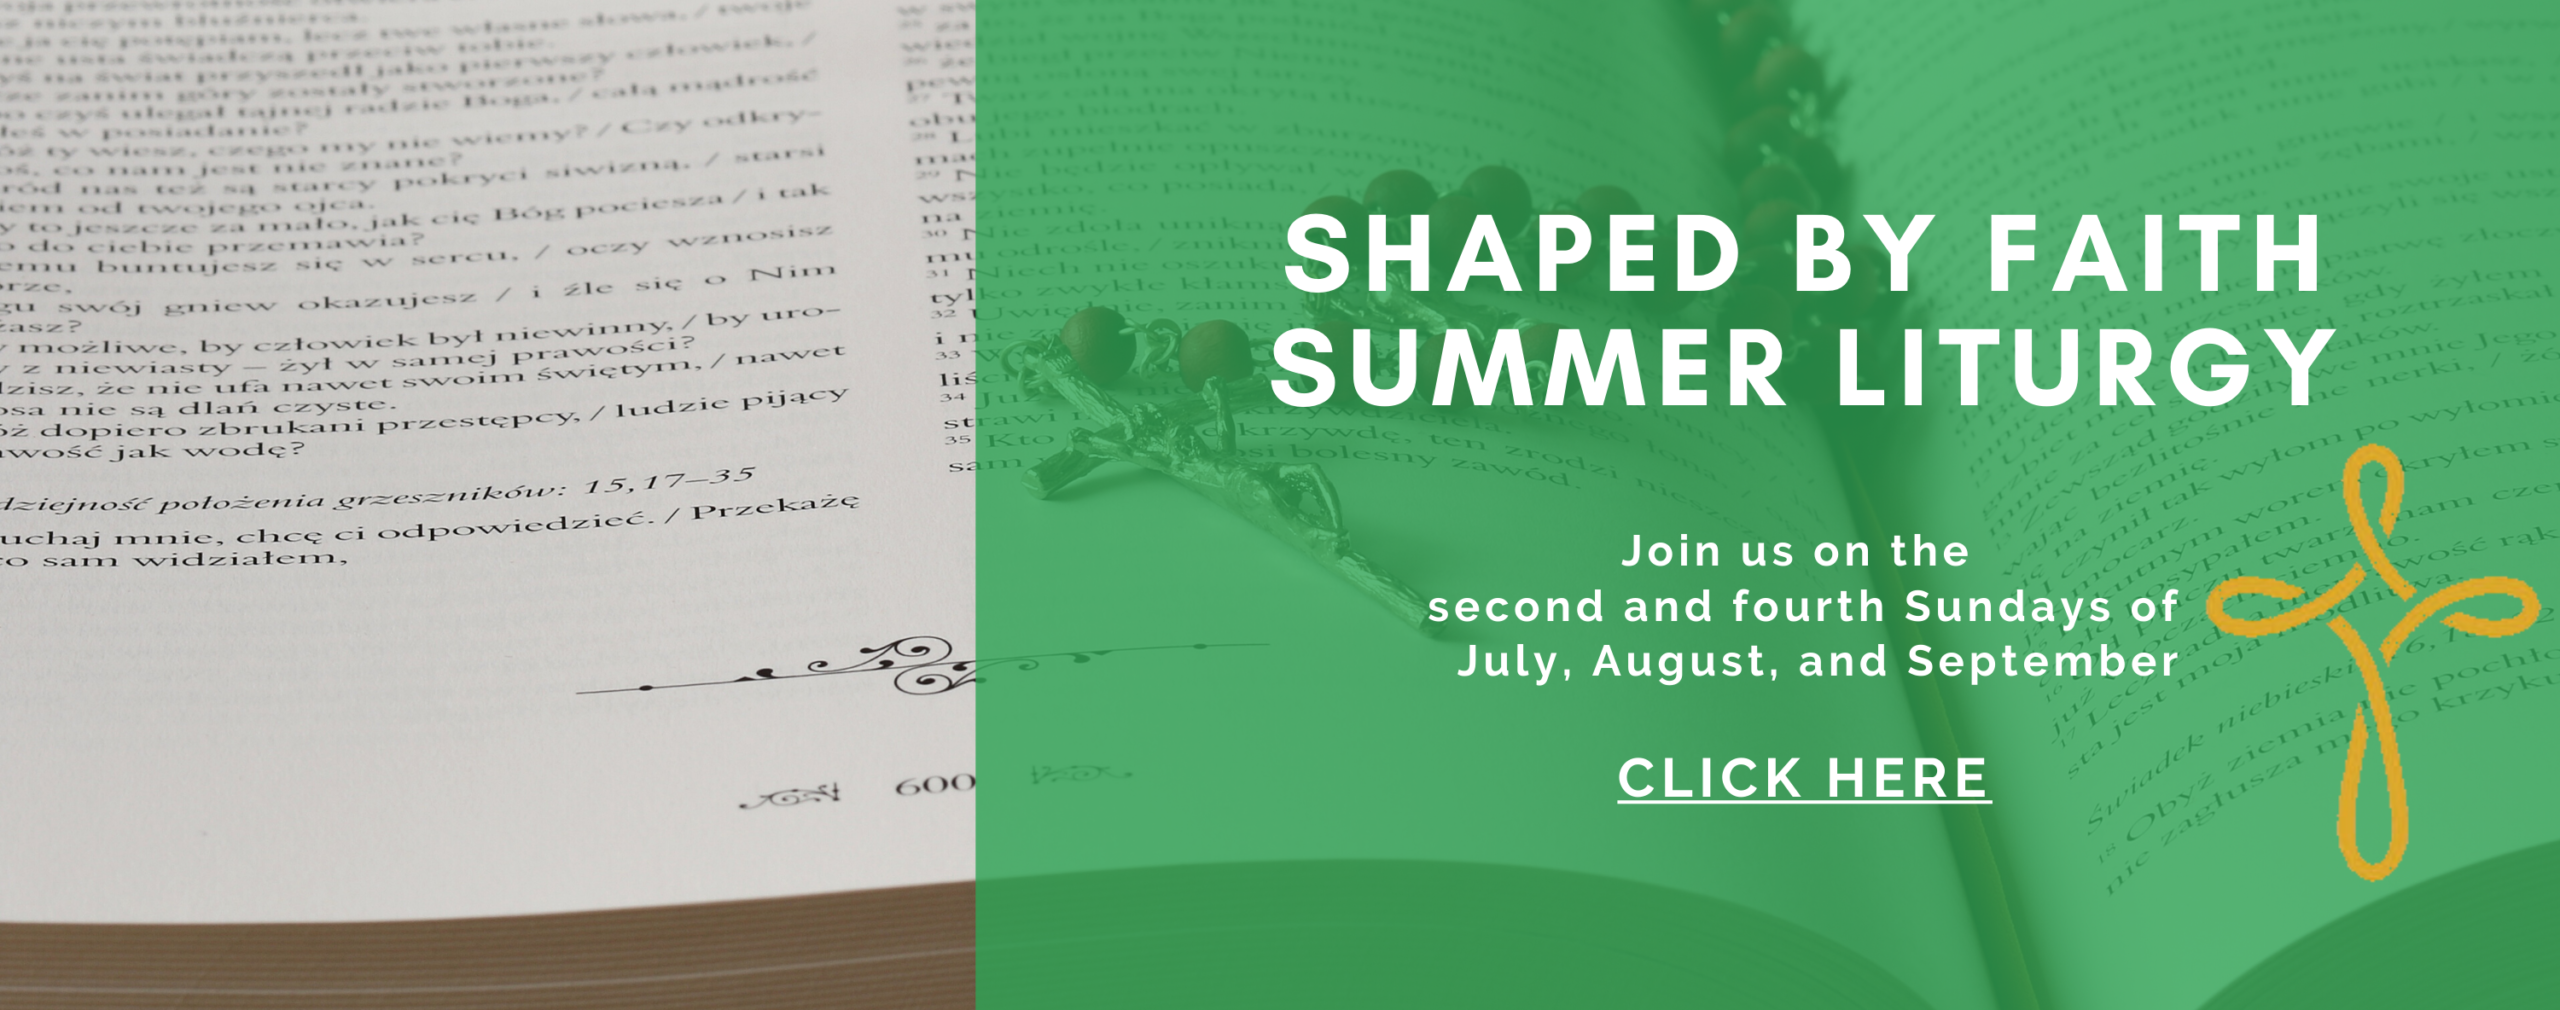 shaped by faith summer liturgy slider